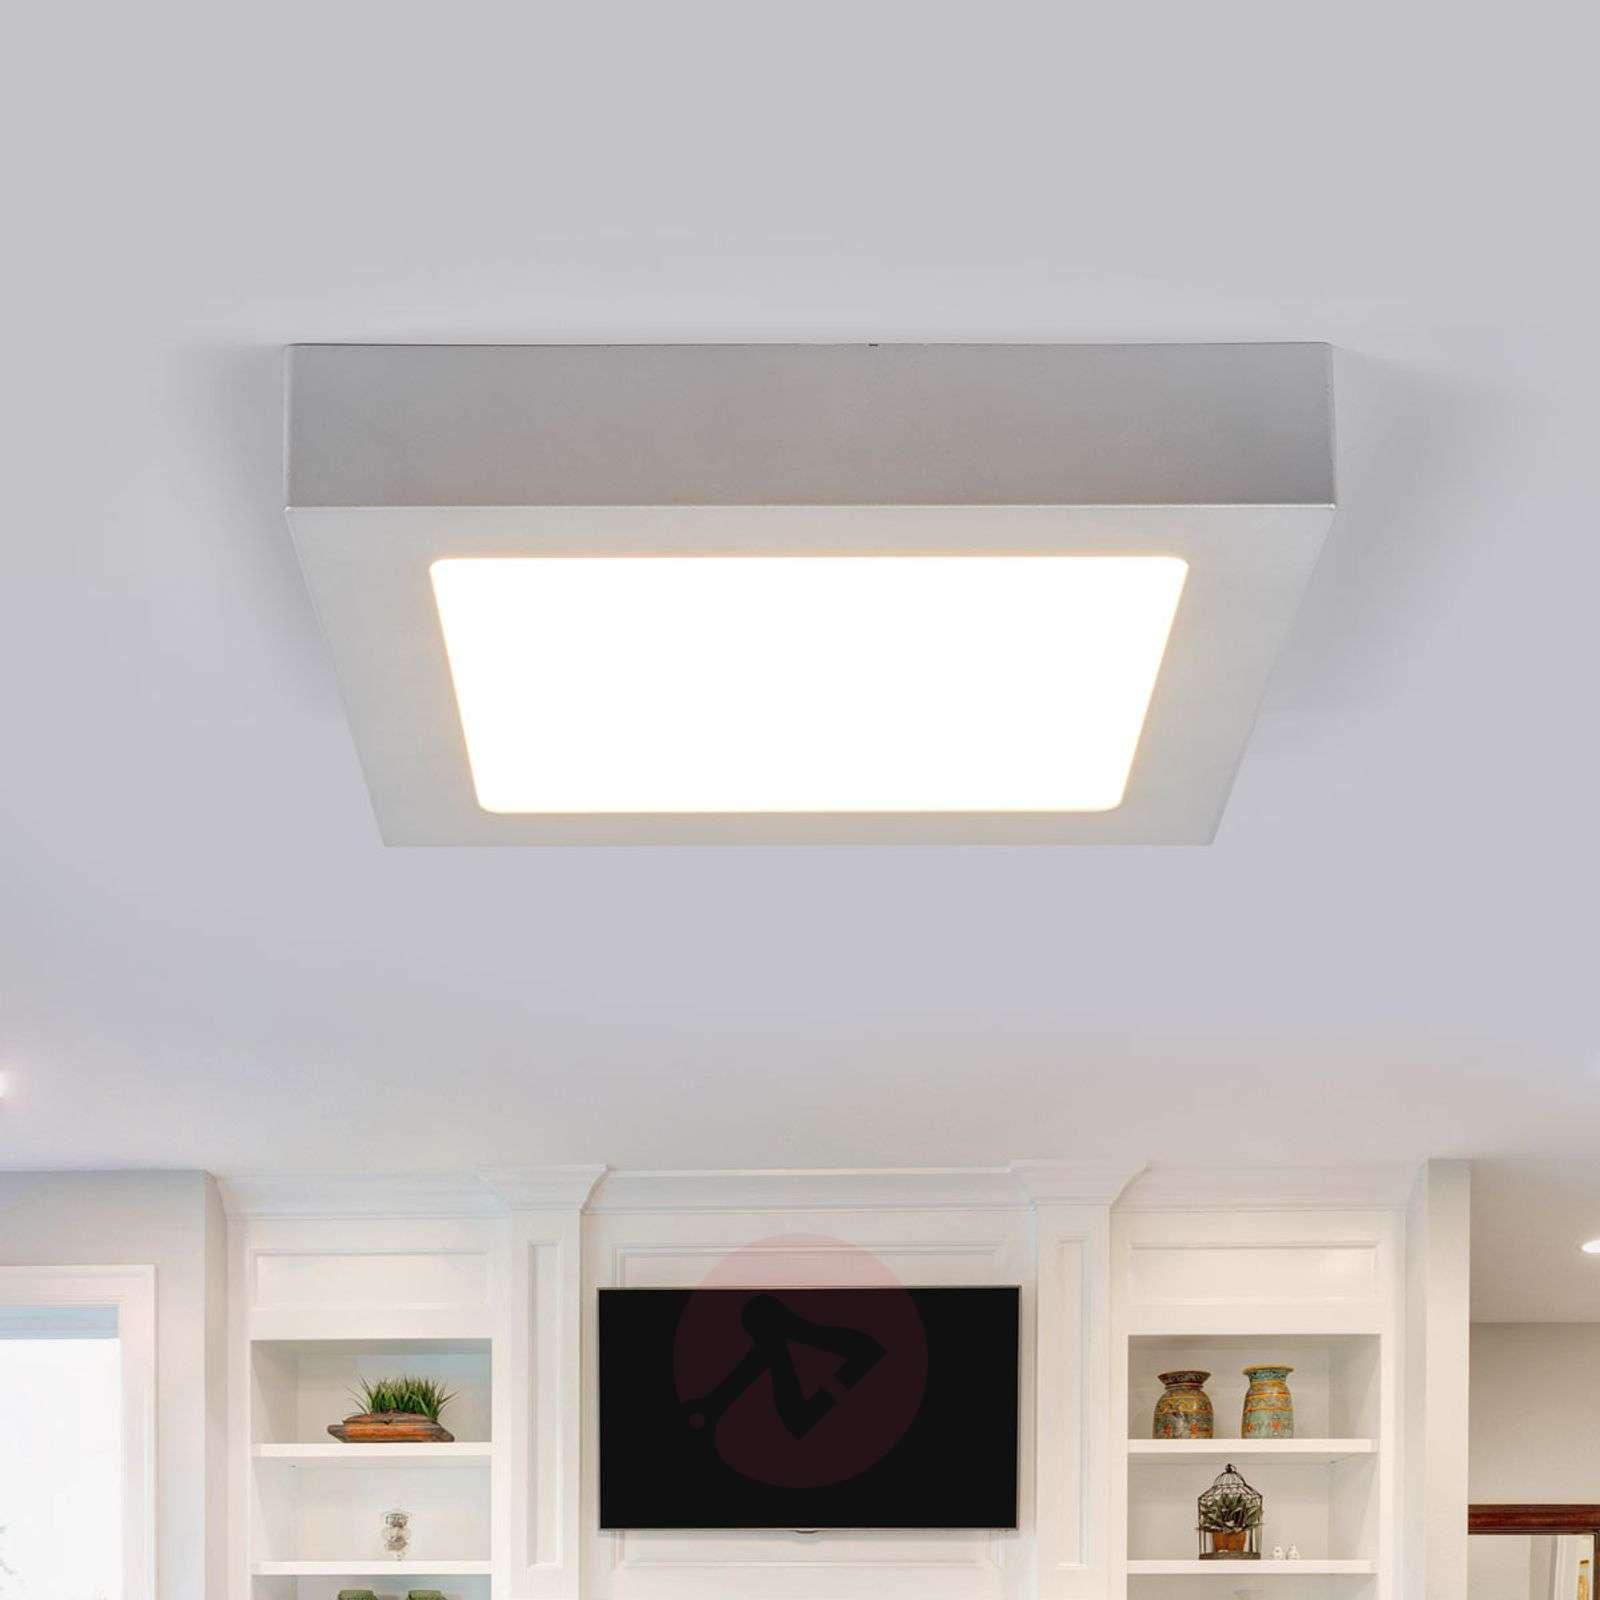 LED-kattovalo Marlo hopea 3000K kulmikas 23,1 cm-9978056-02